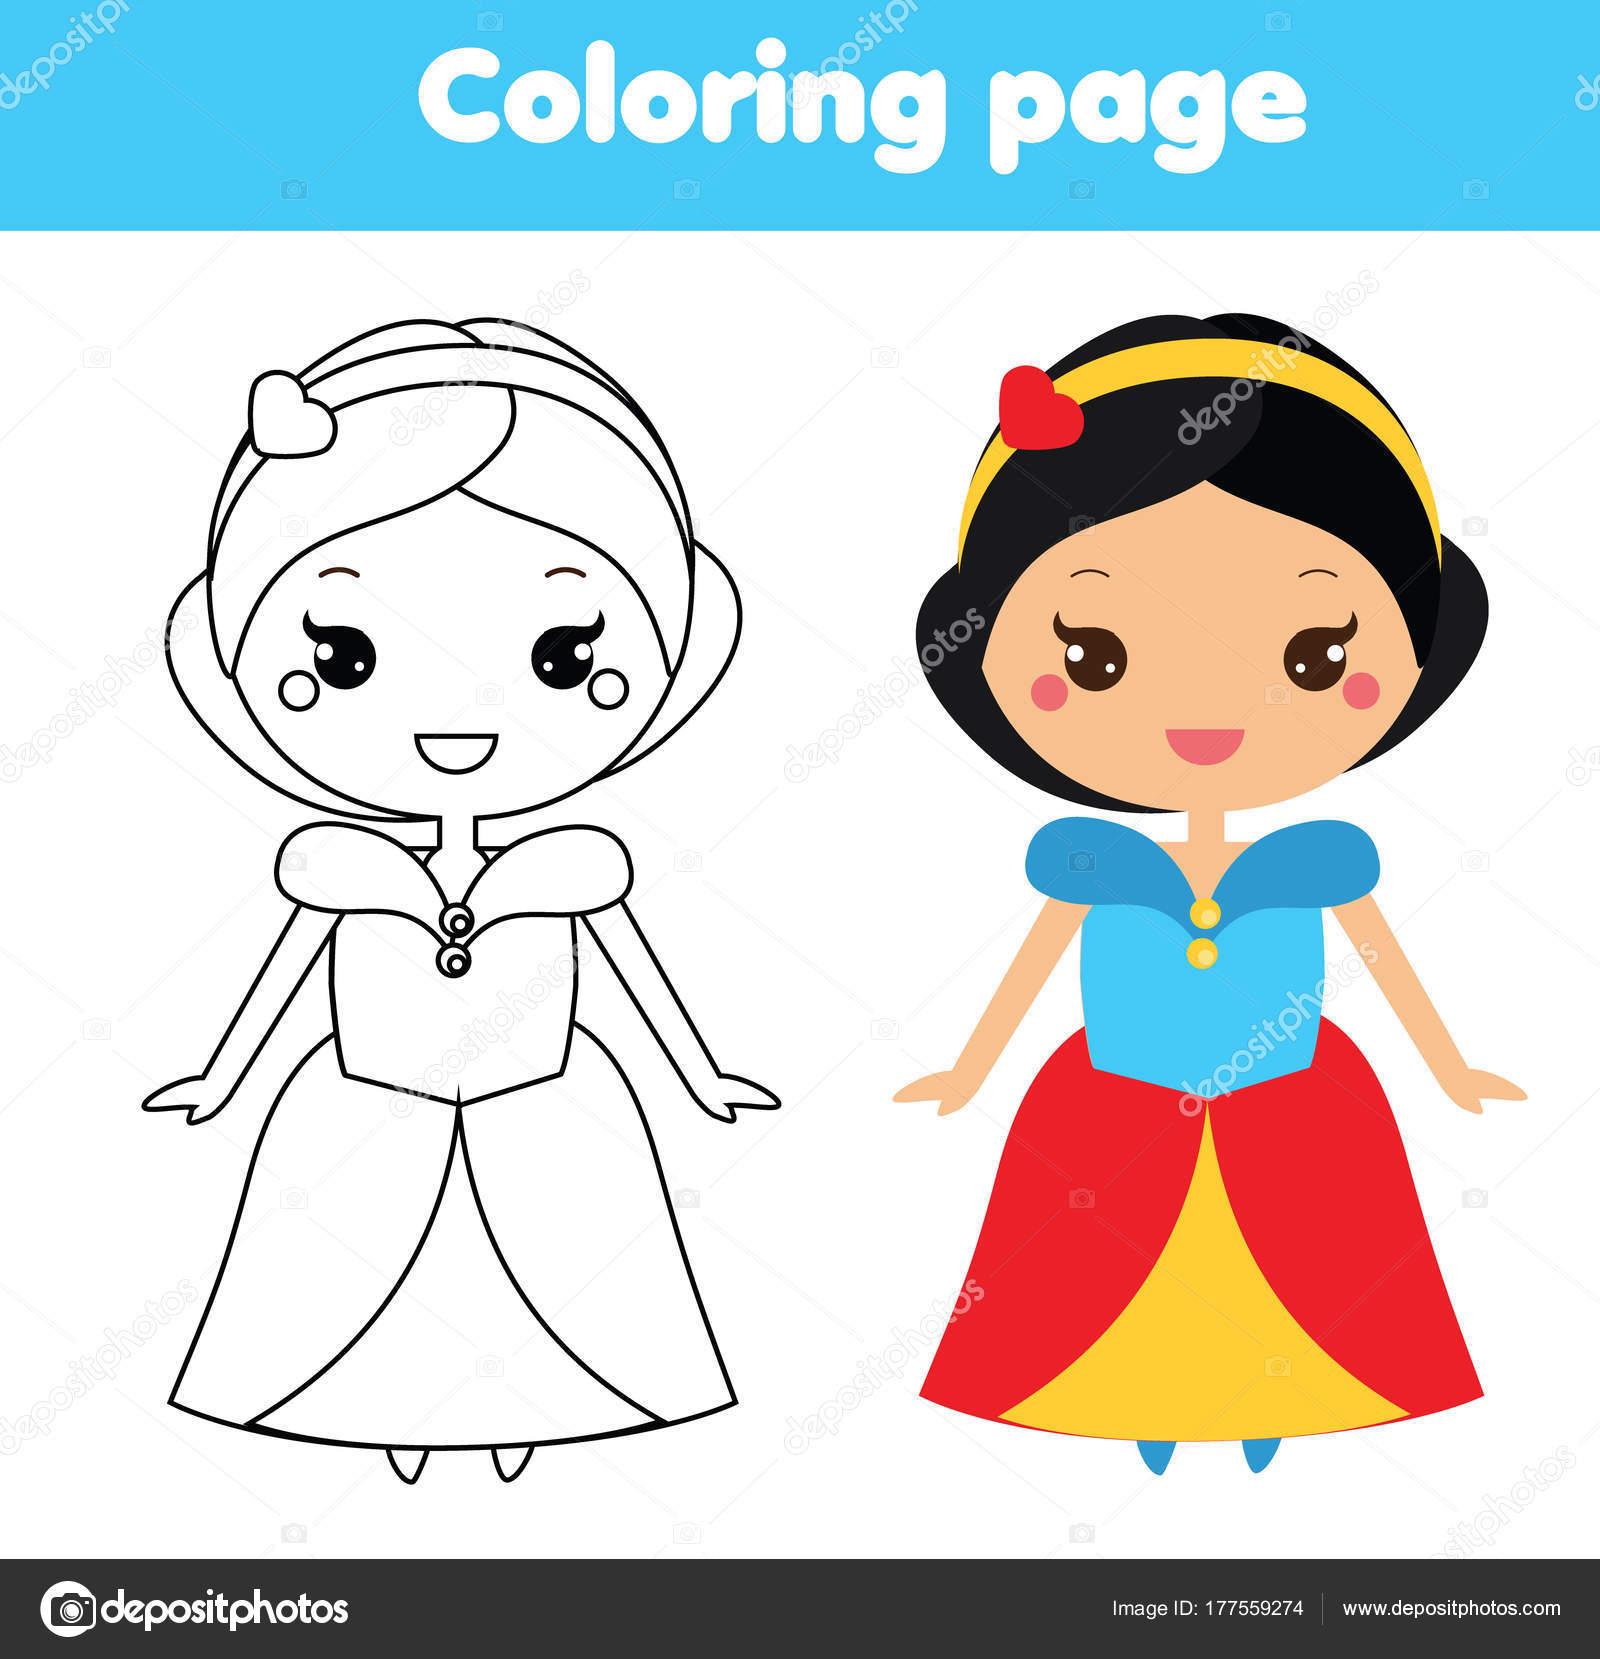 Pictures Kawaii To Color Coloring Page Cute Princess Kawaii